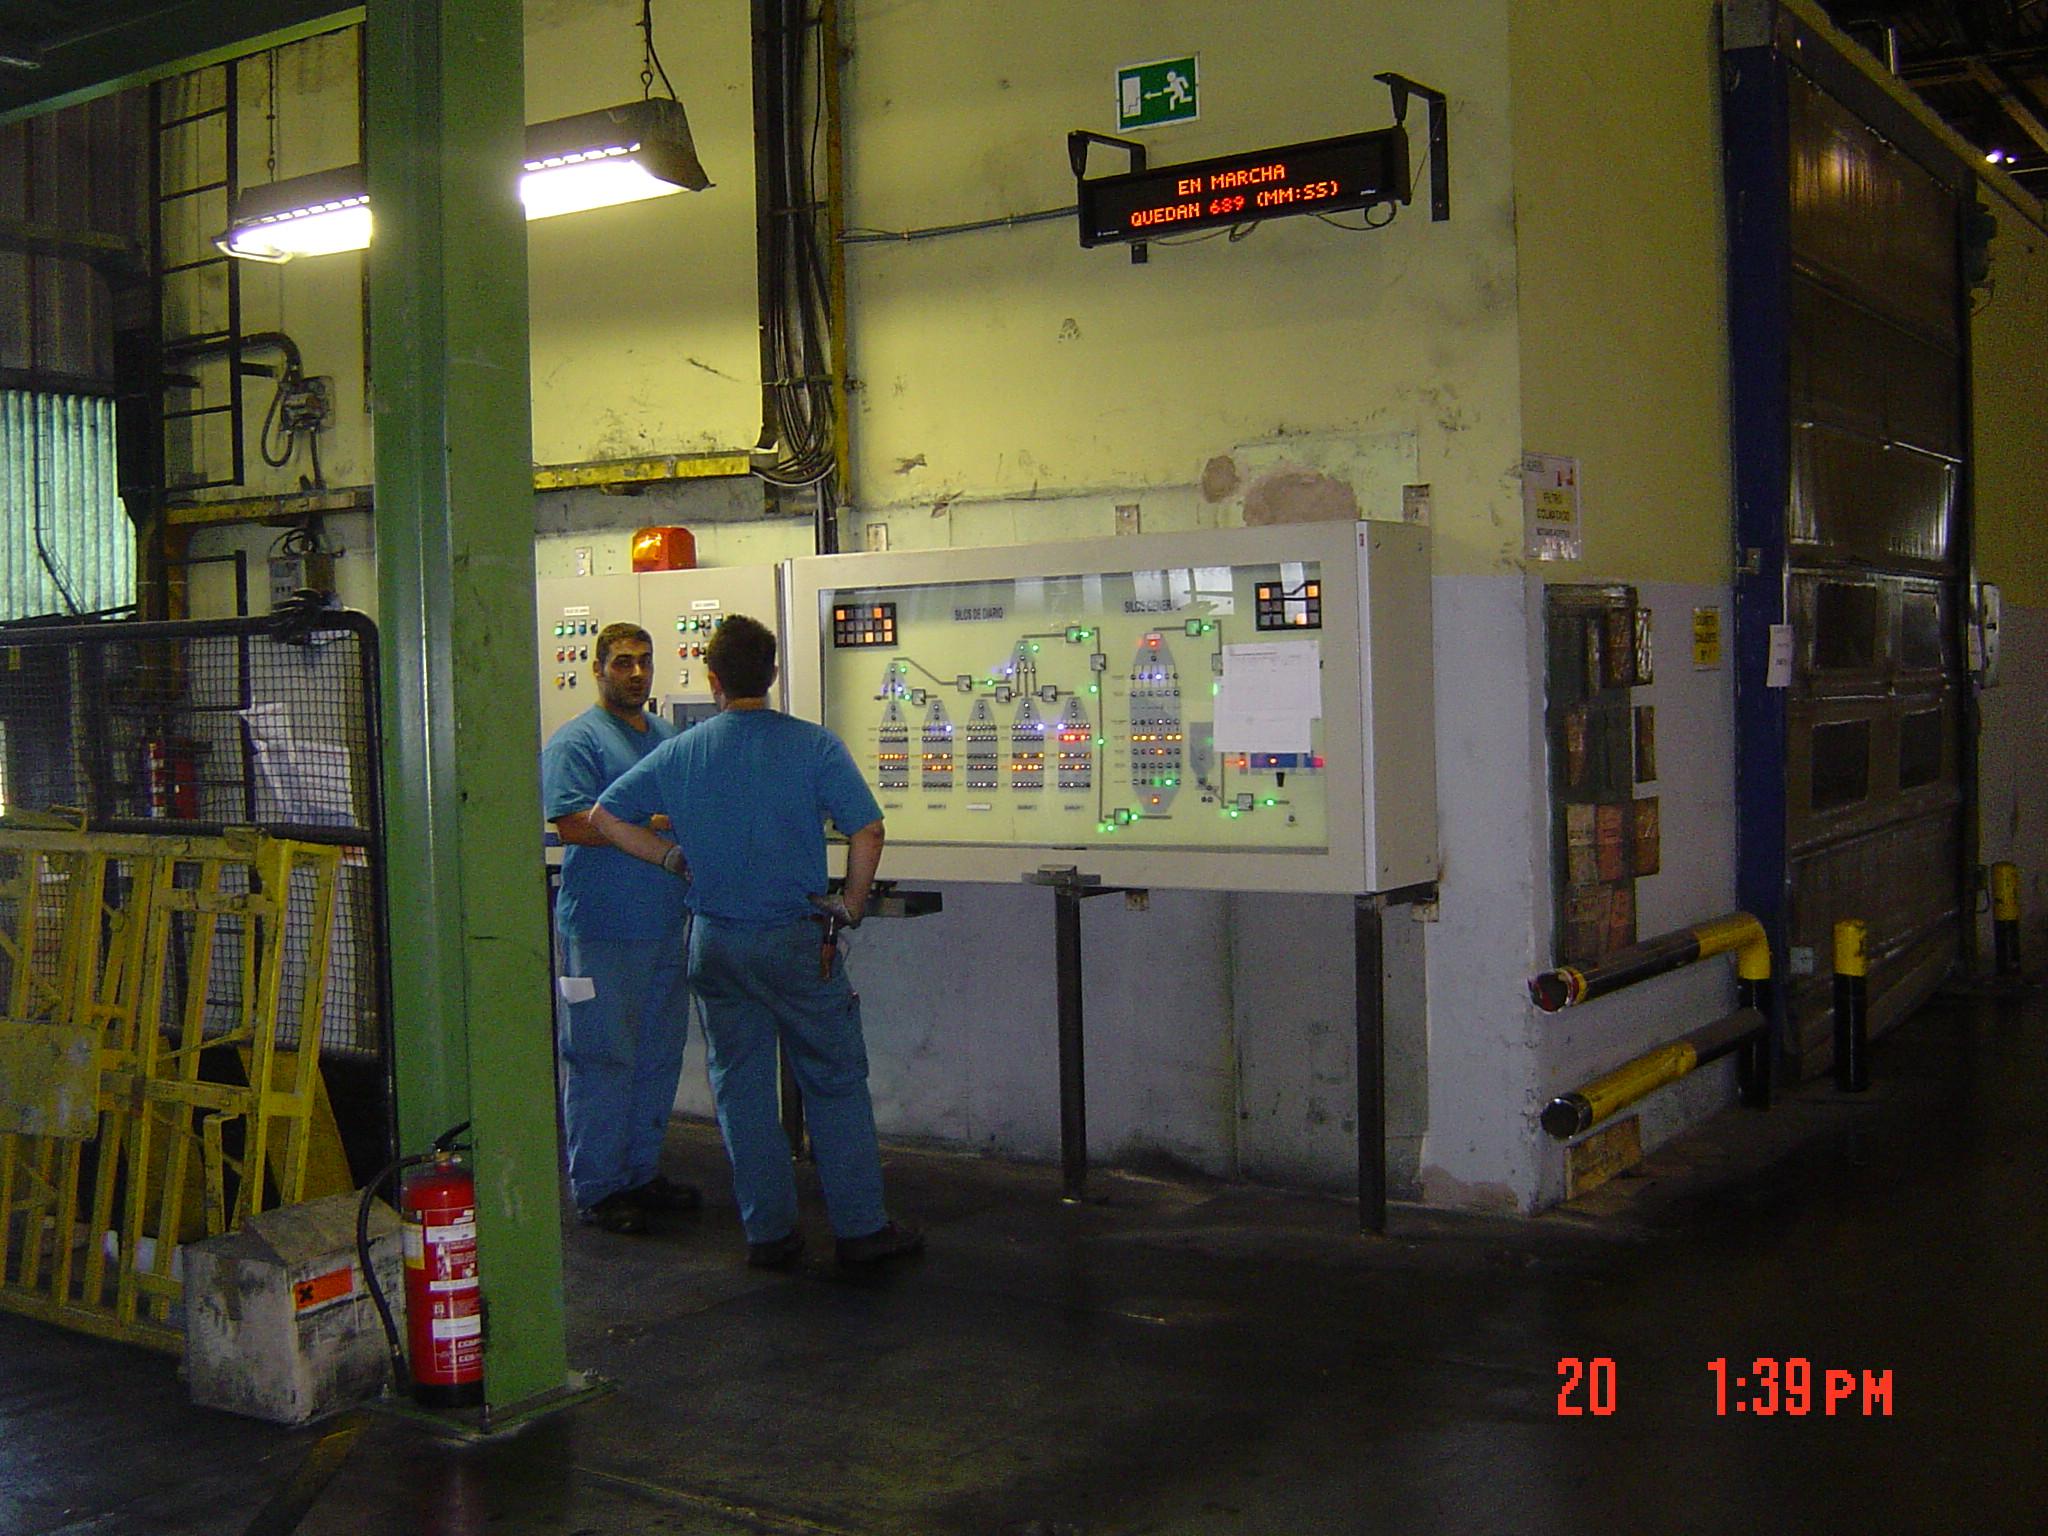 Automatización Silos planta Bridgestone, Burgos (España, 2007)